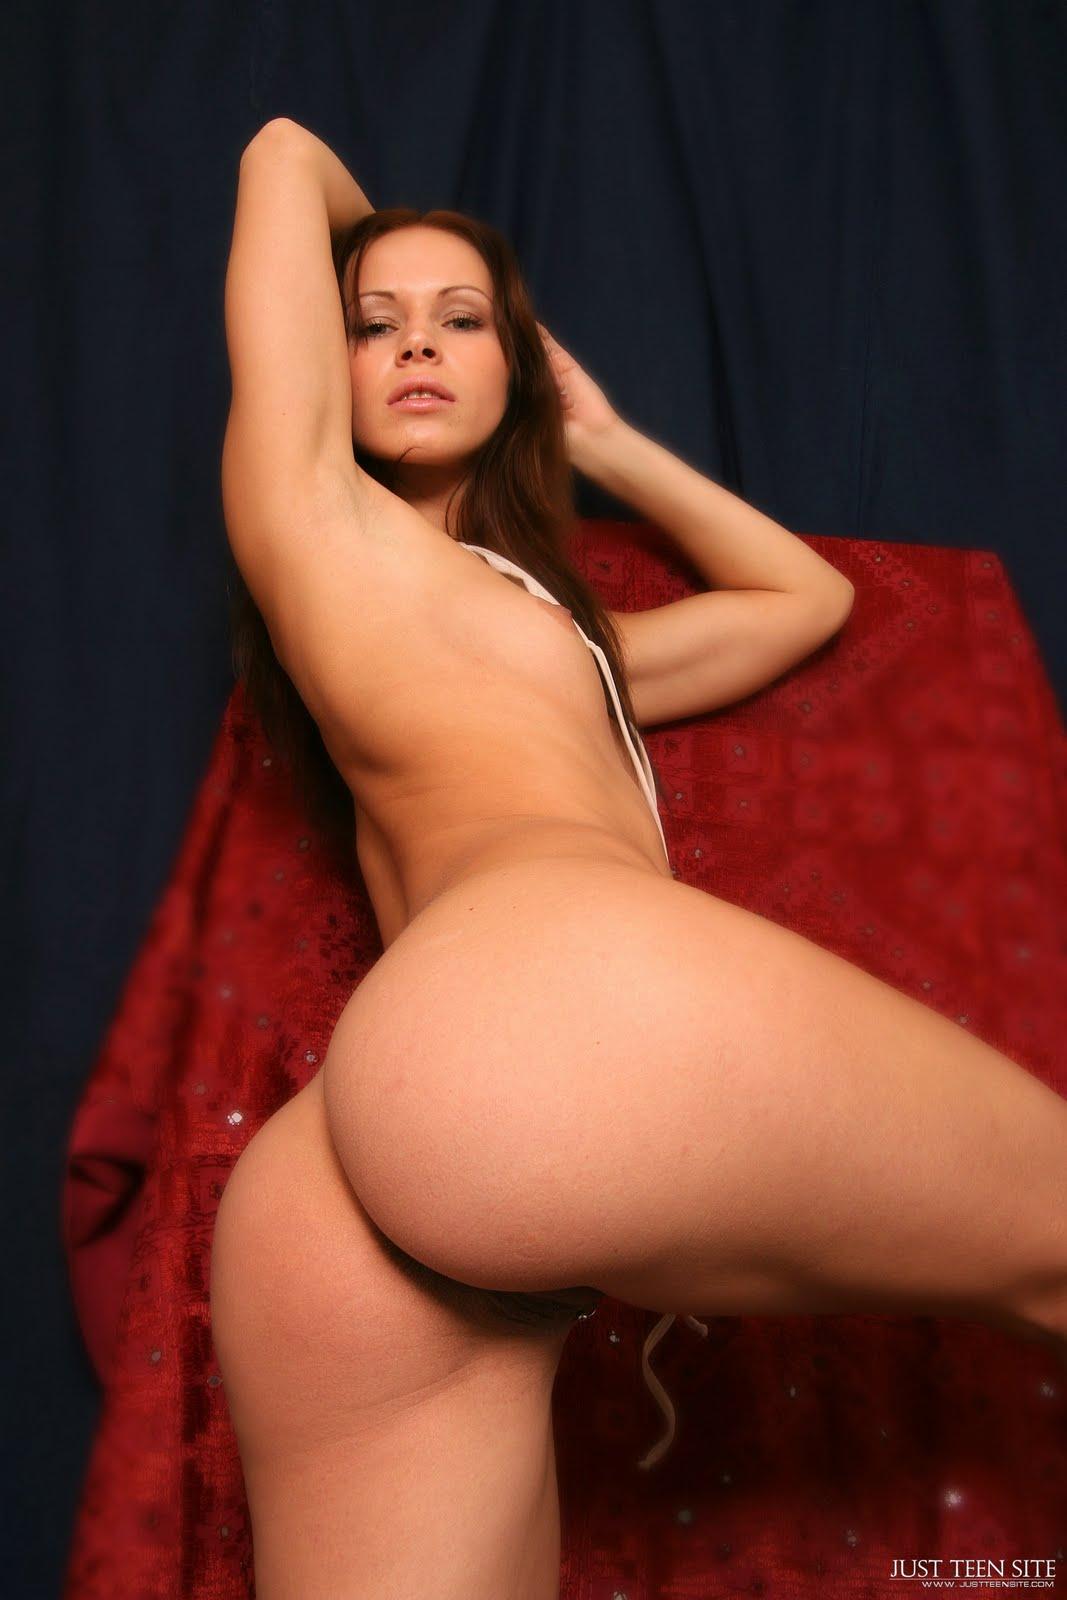 Chica Teen Desnuda